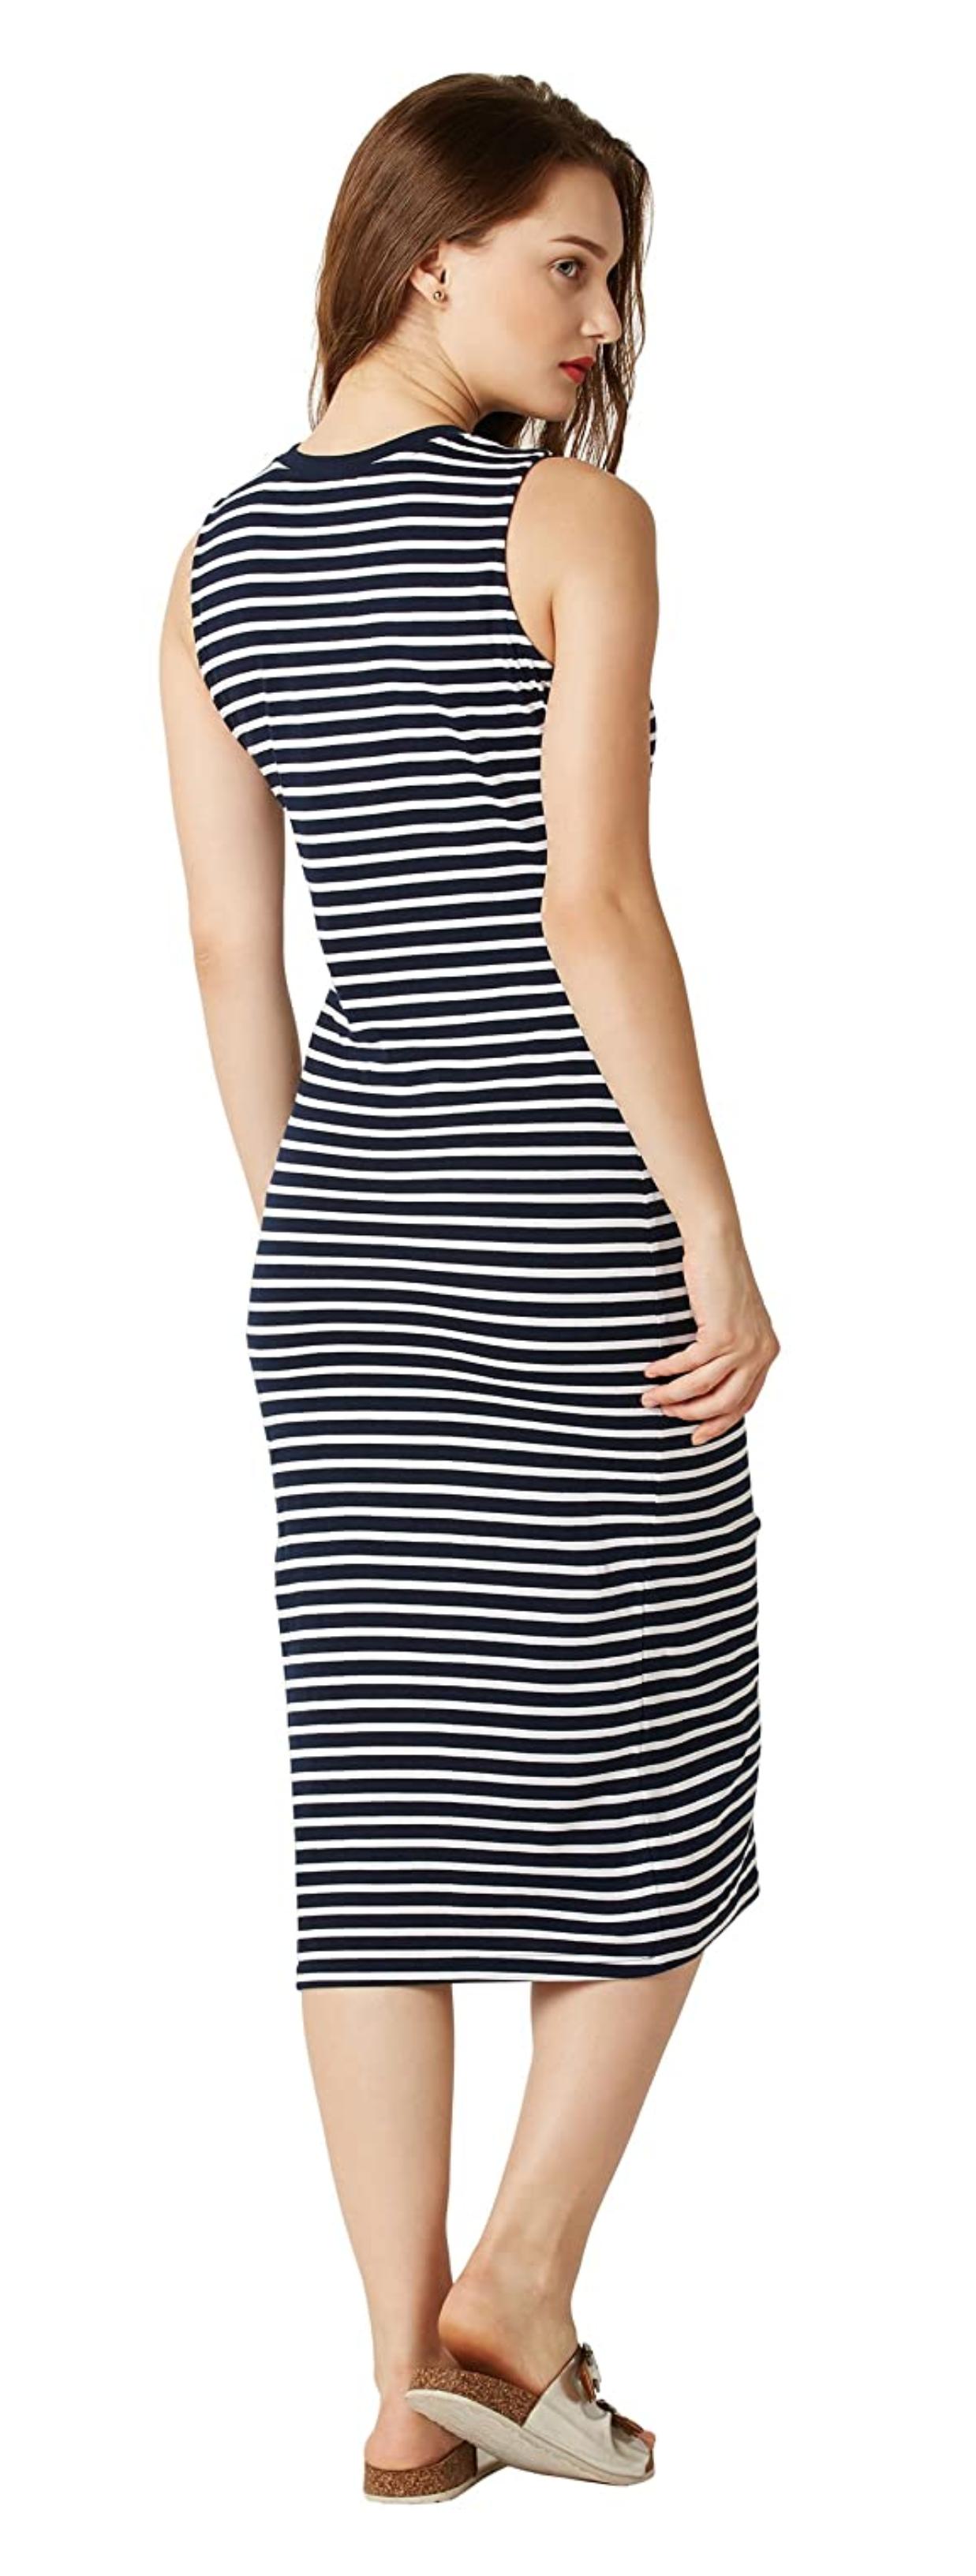 Miss Chase Women S Comfortable Cotton Striped Bodycon Midi Dress Striped Bodycon Midi Dress Bodycon Dress Half Sleeve Dresses [ 3264 x 1237 Pixel ]